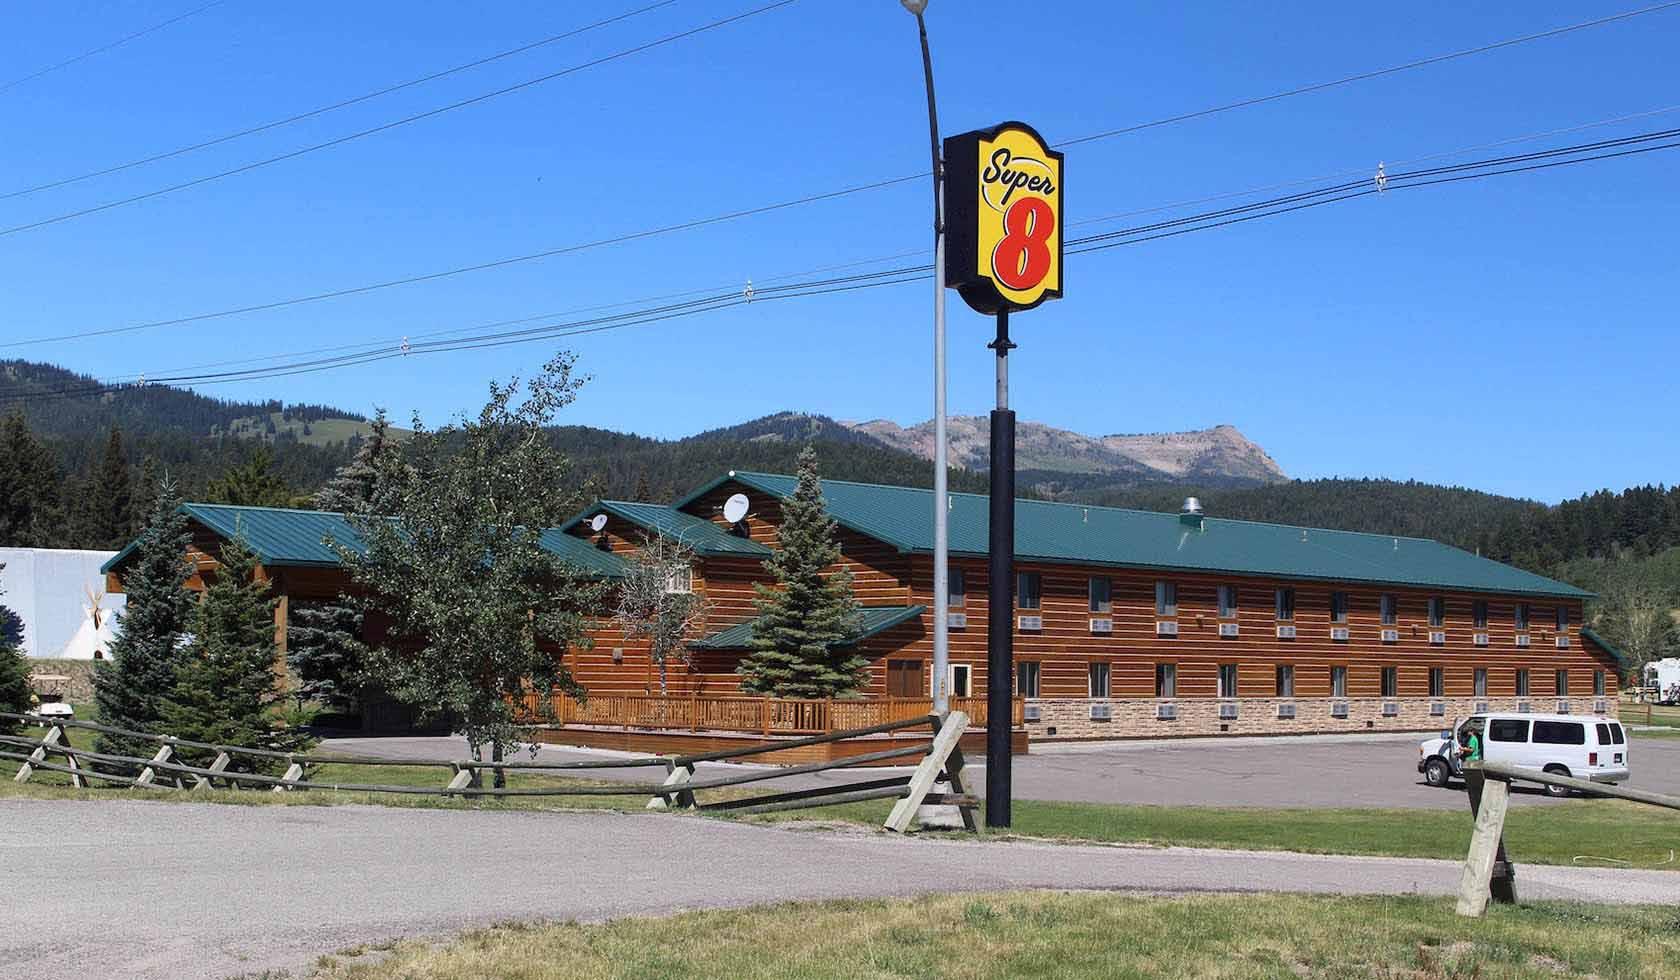 West Yellowstone Super 8 Motel profile image